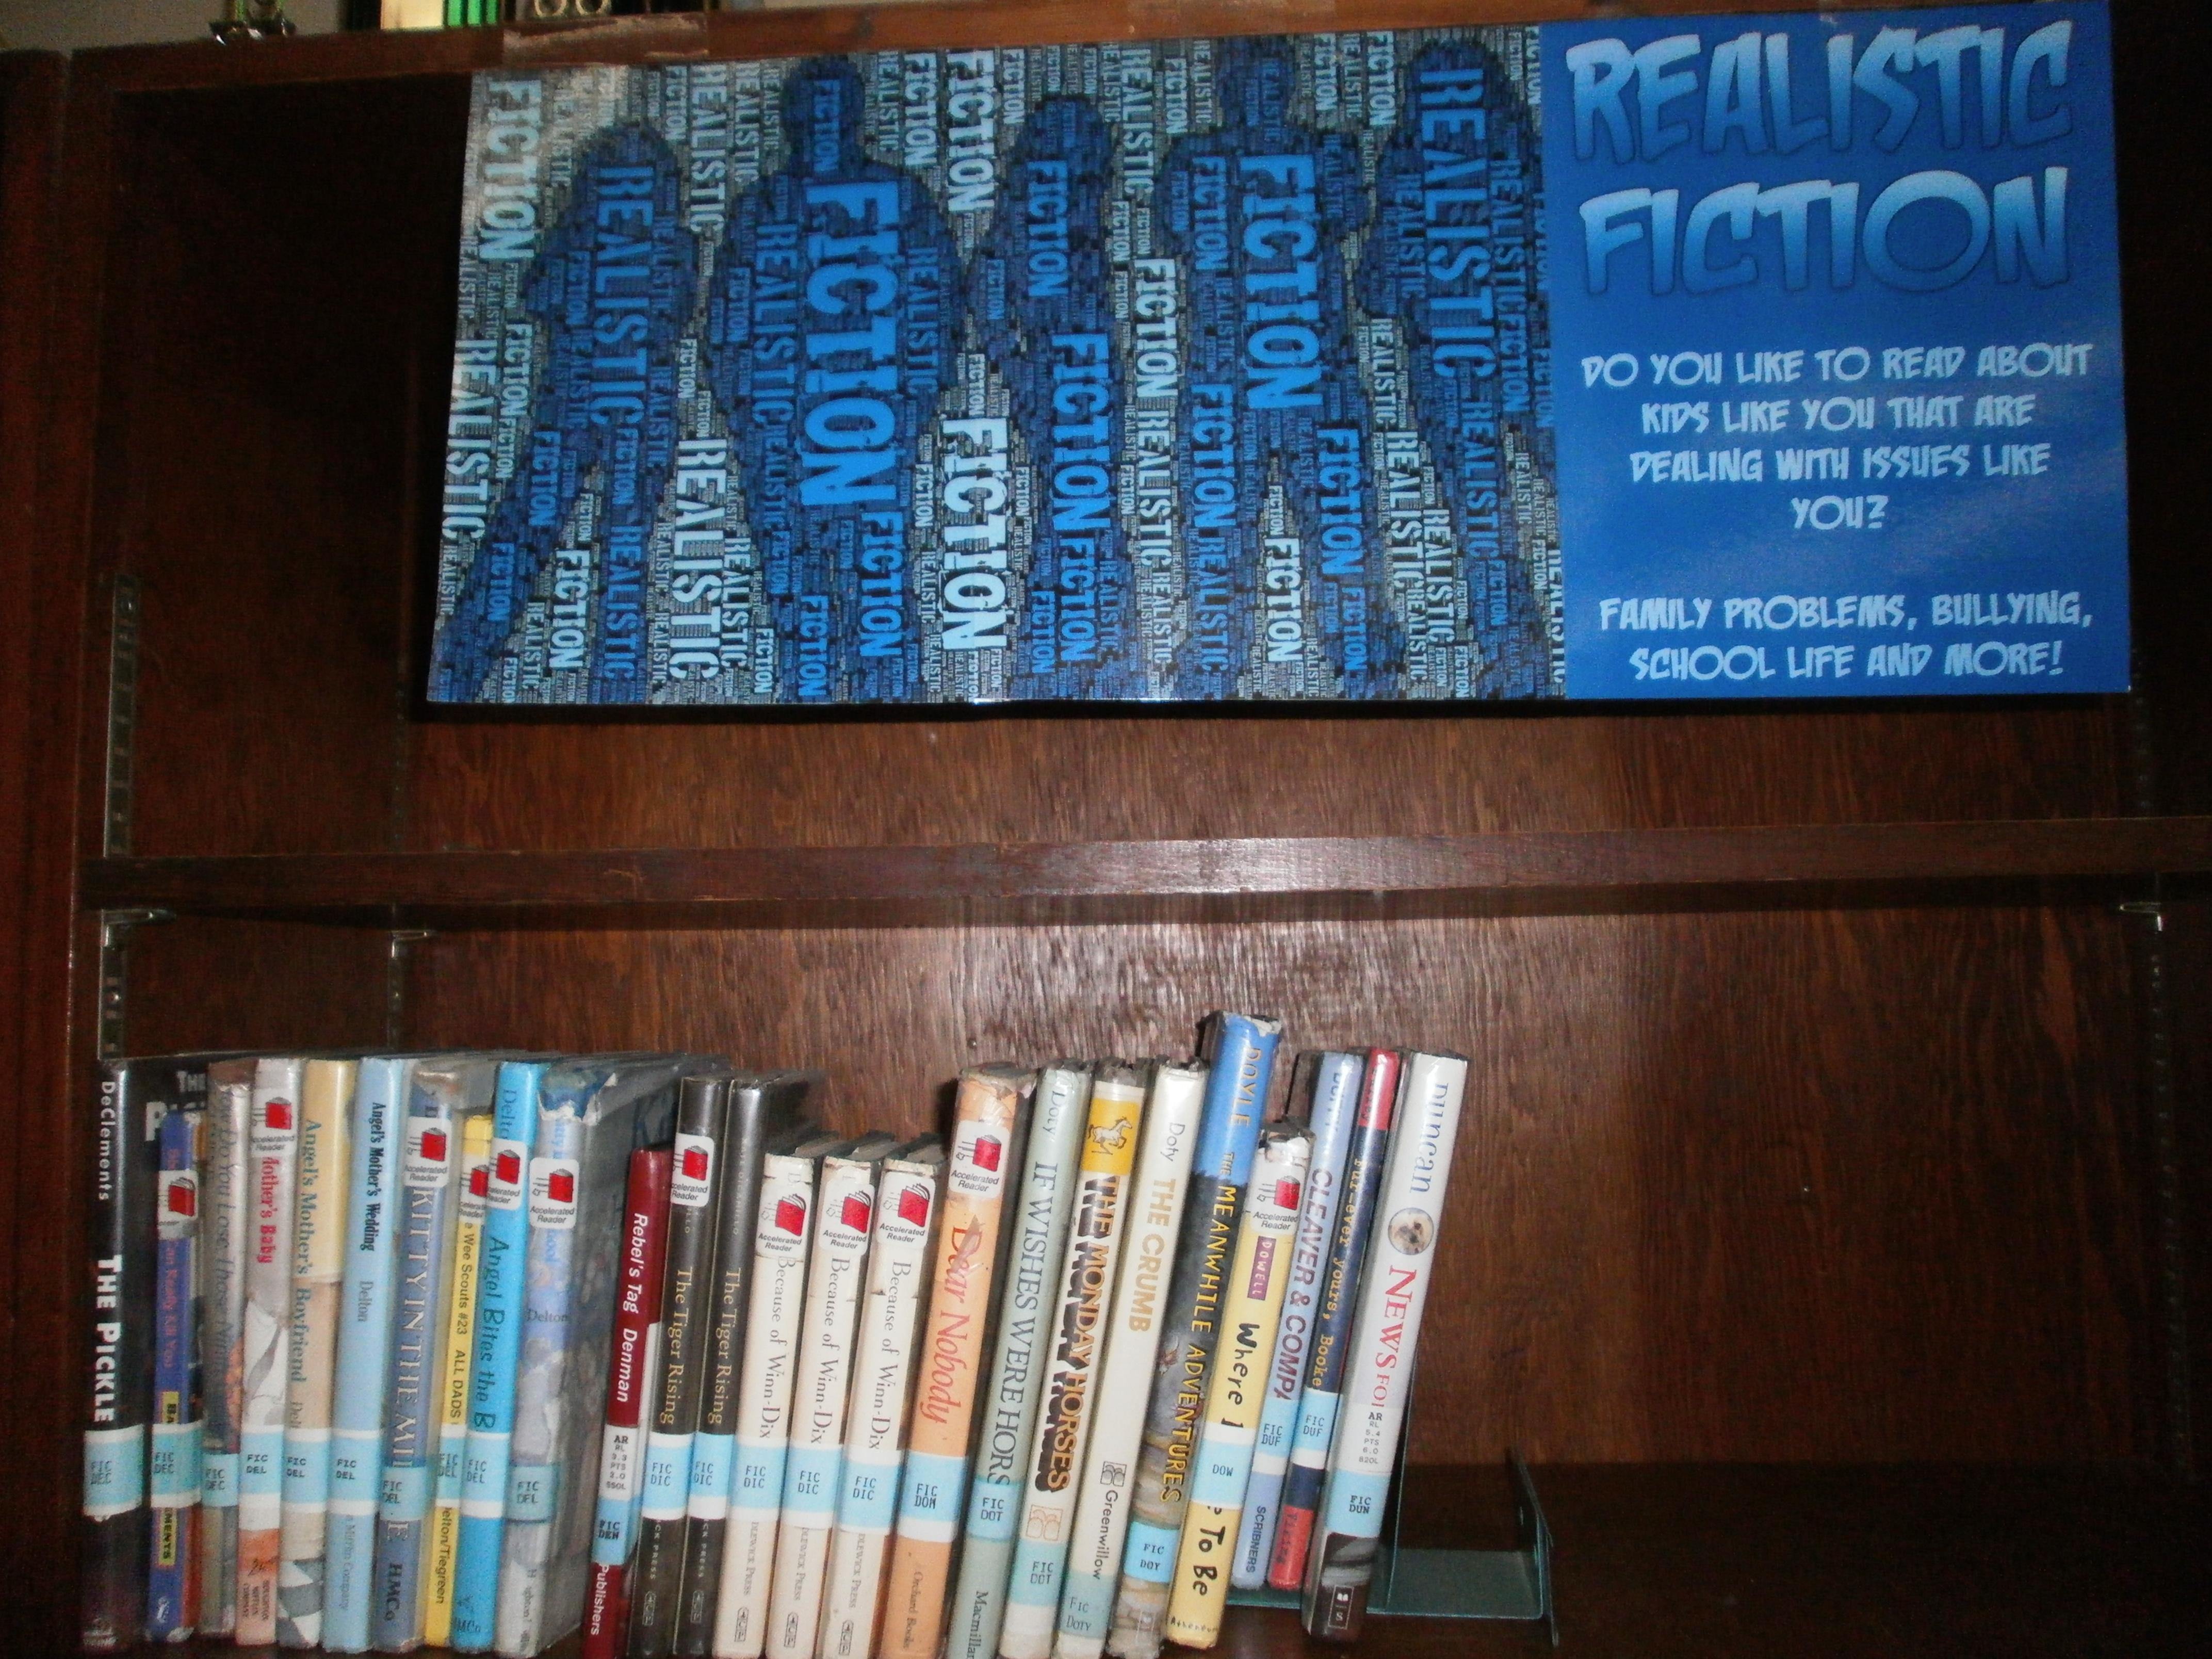 Bookshelf clipart genre. Shelving mighty little librarian